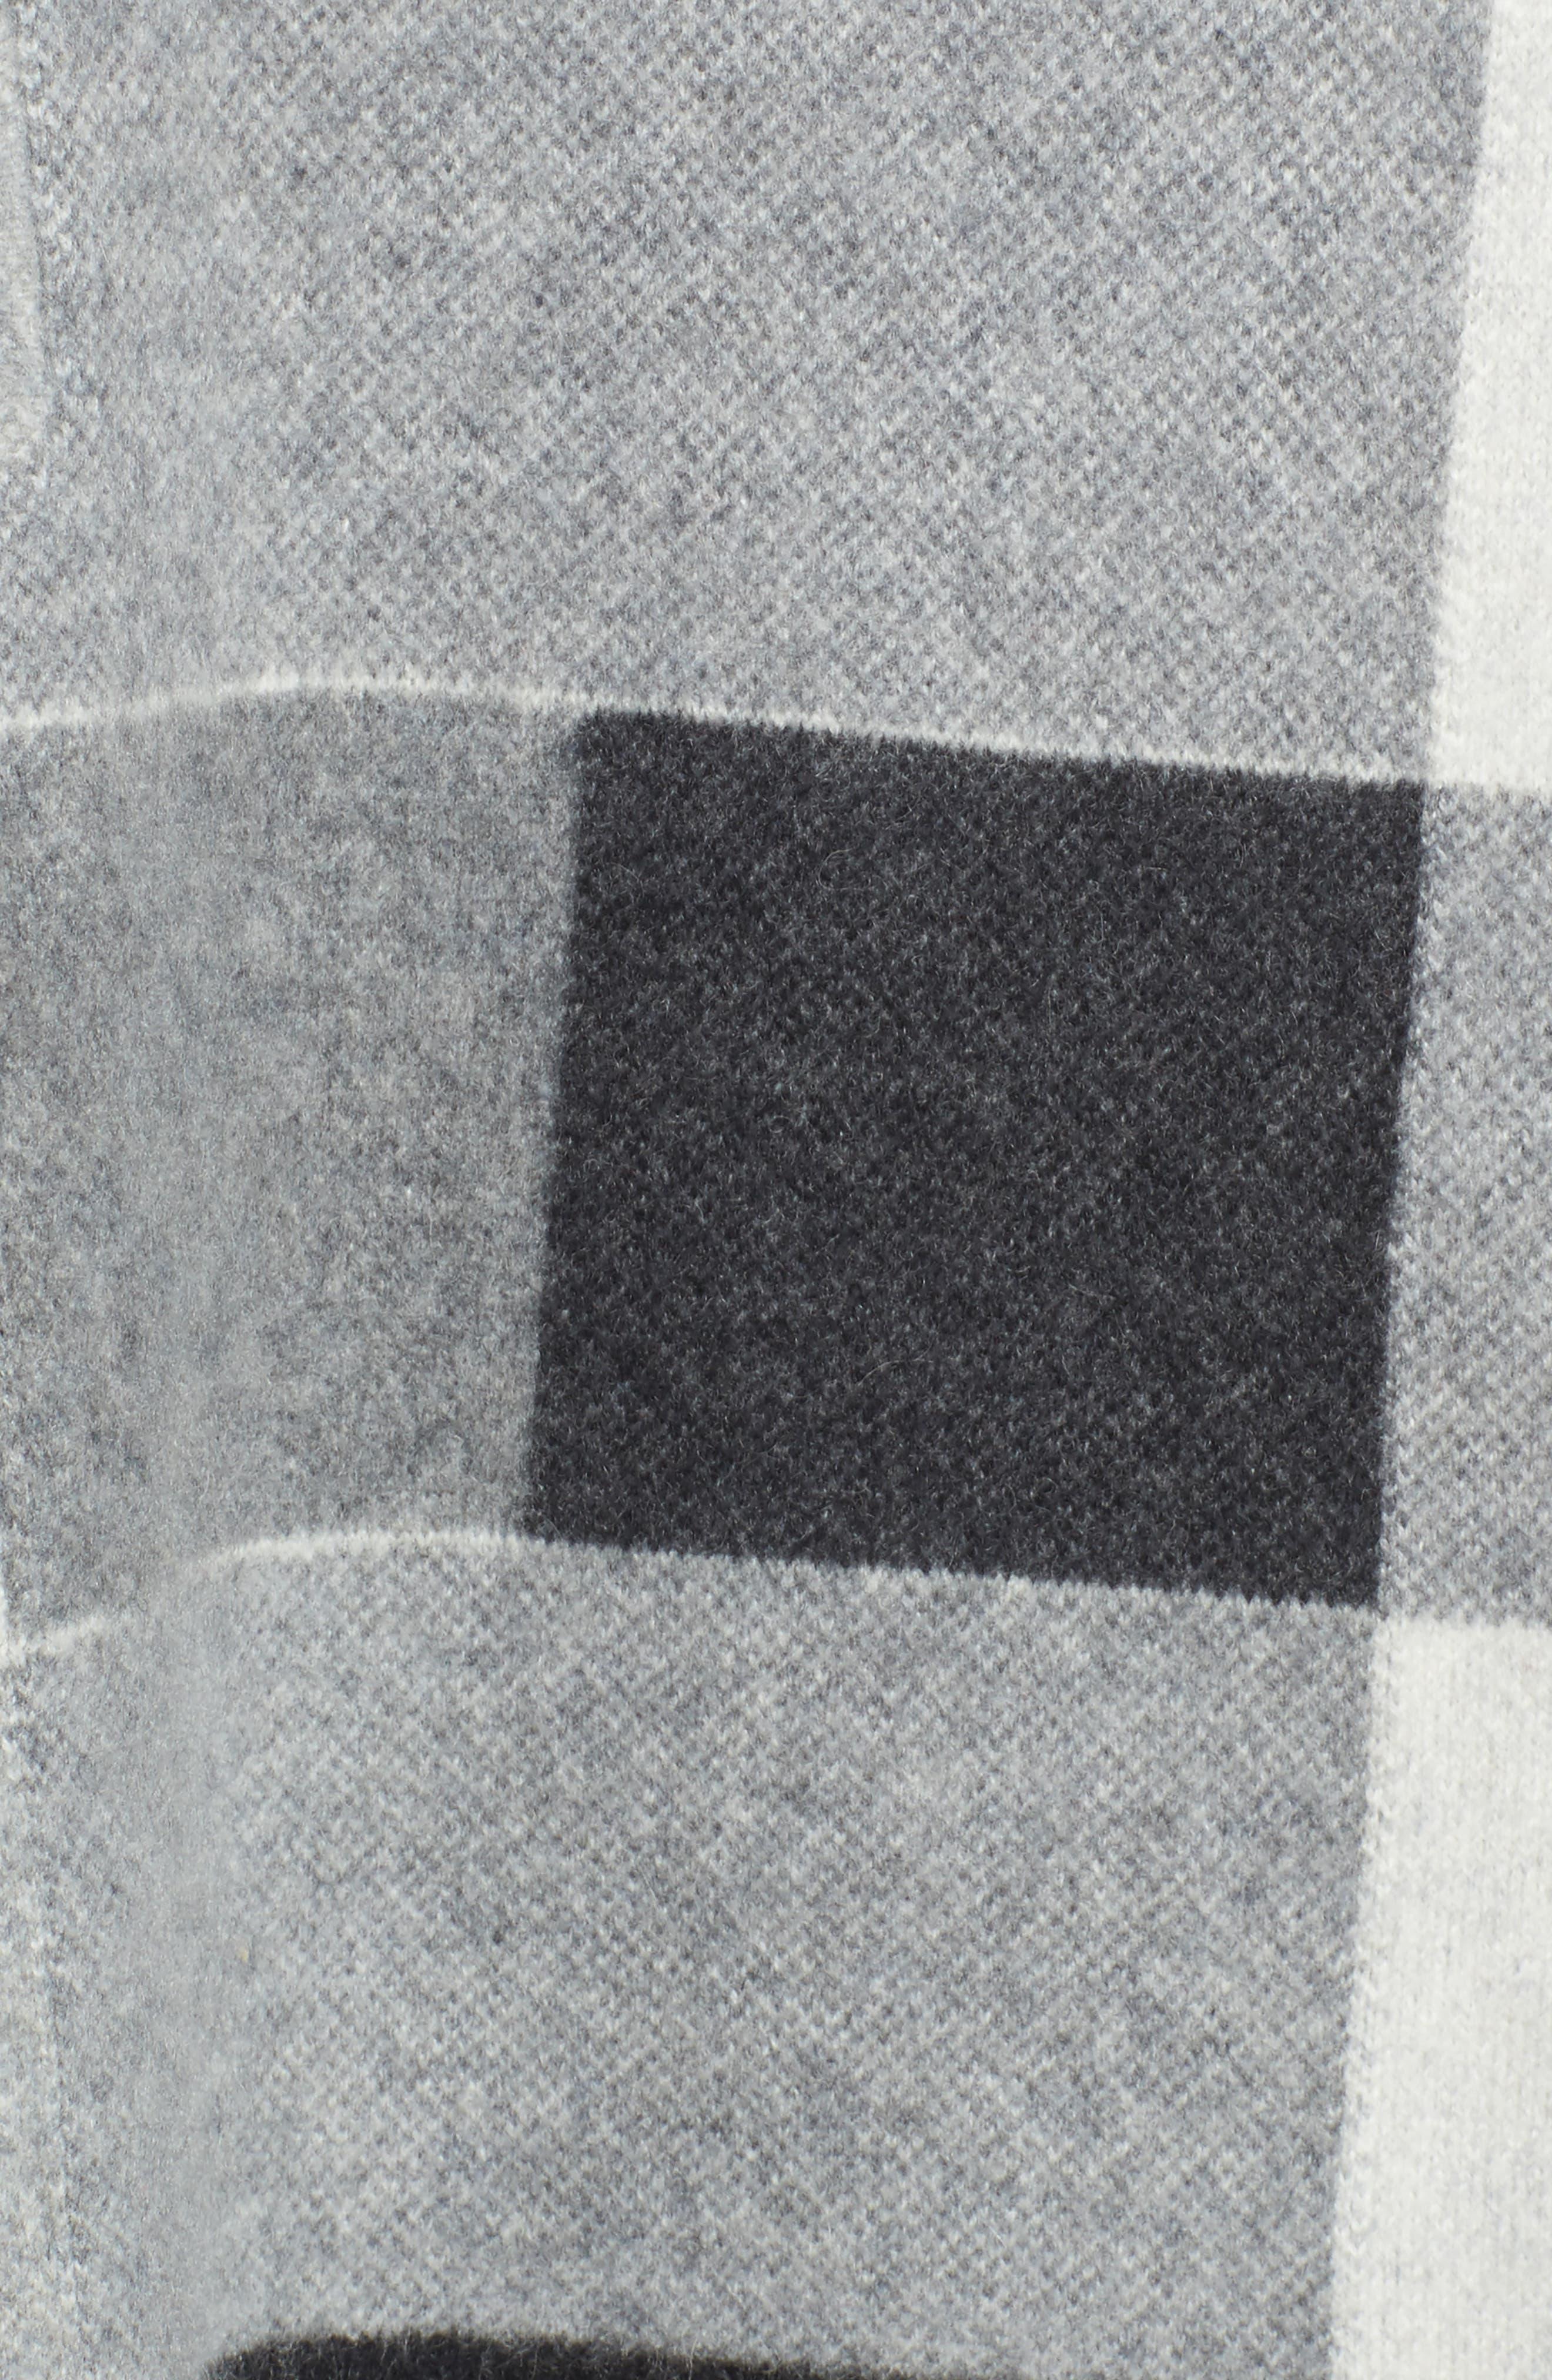 Check Plaid Cashmere Sweater,                             Alternate thumbnail 5, color,